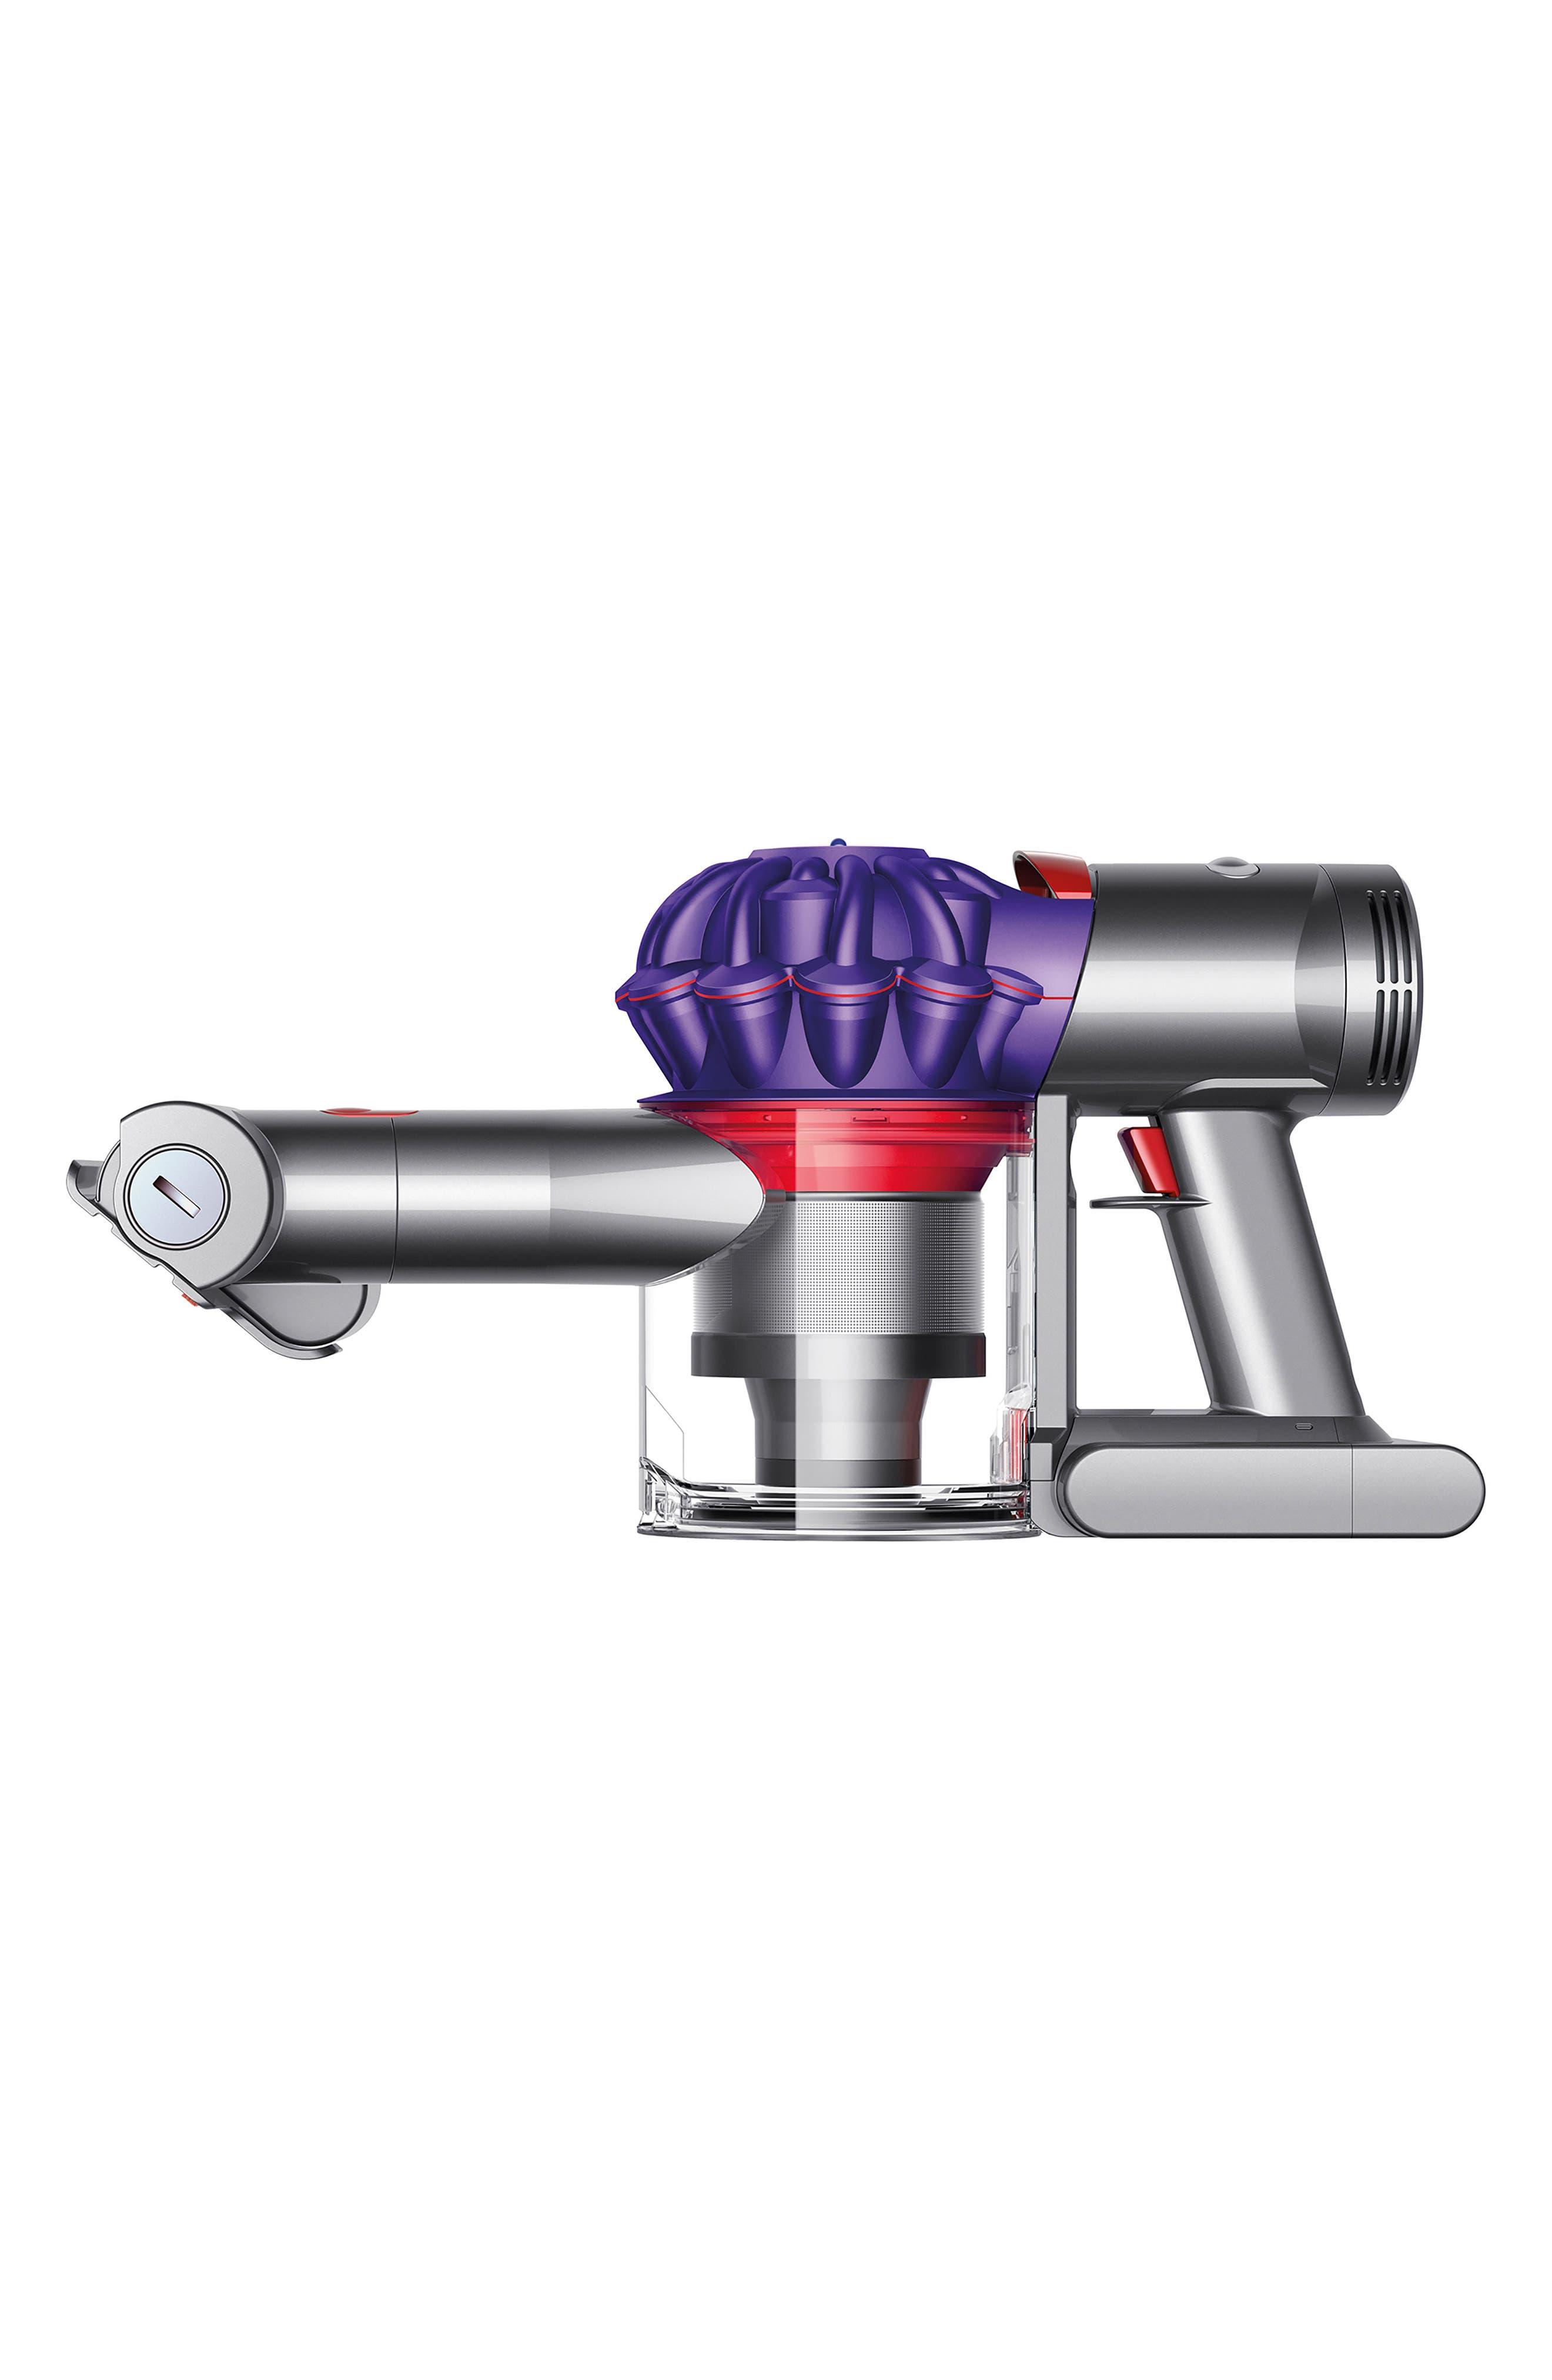 Main Image - Dyson V7 Car & Boat Cordless Handheld Vacuum